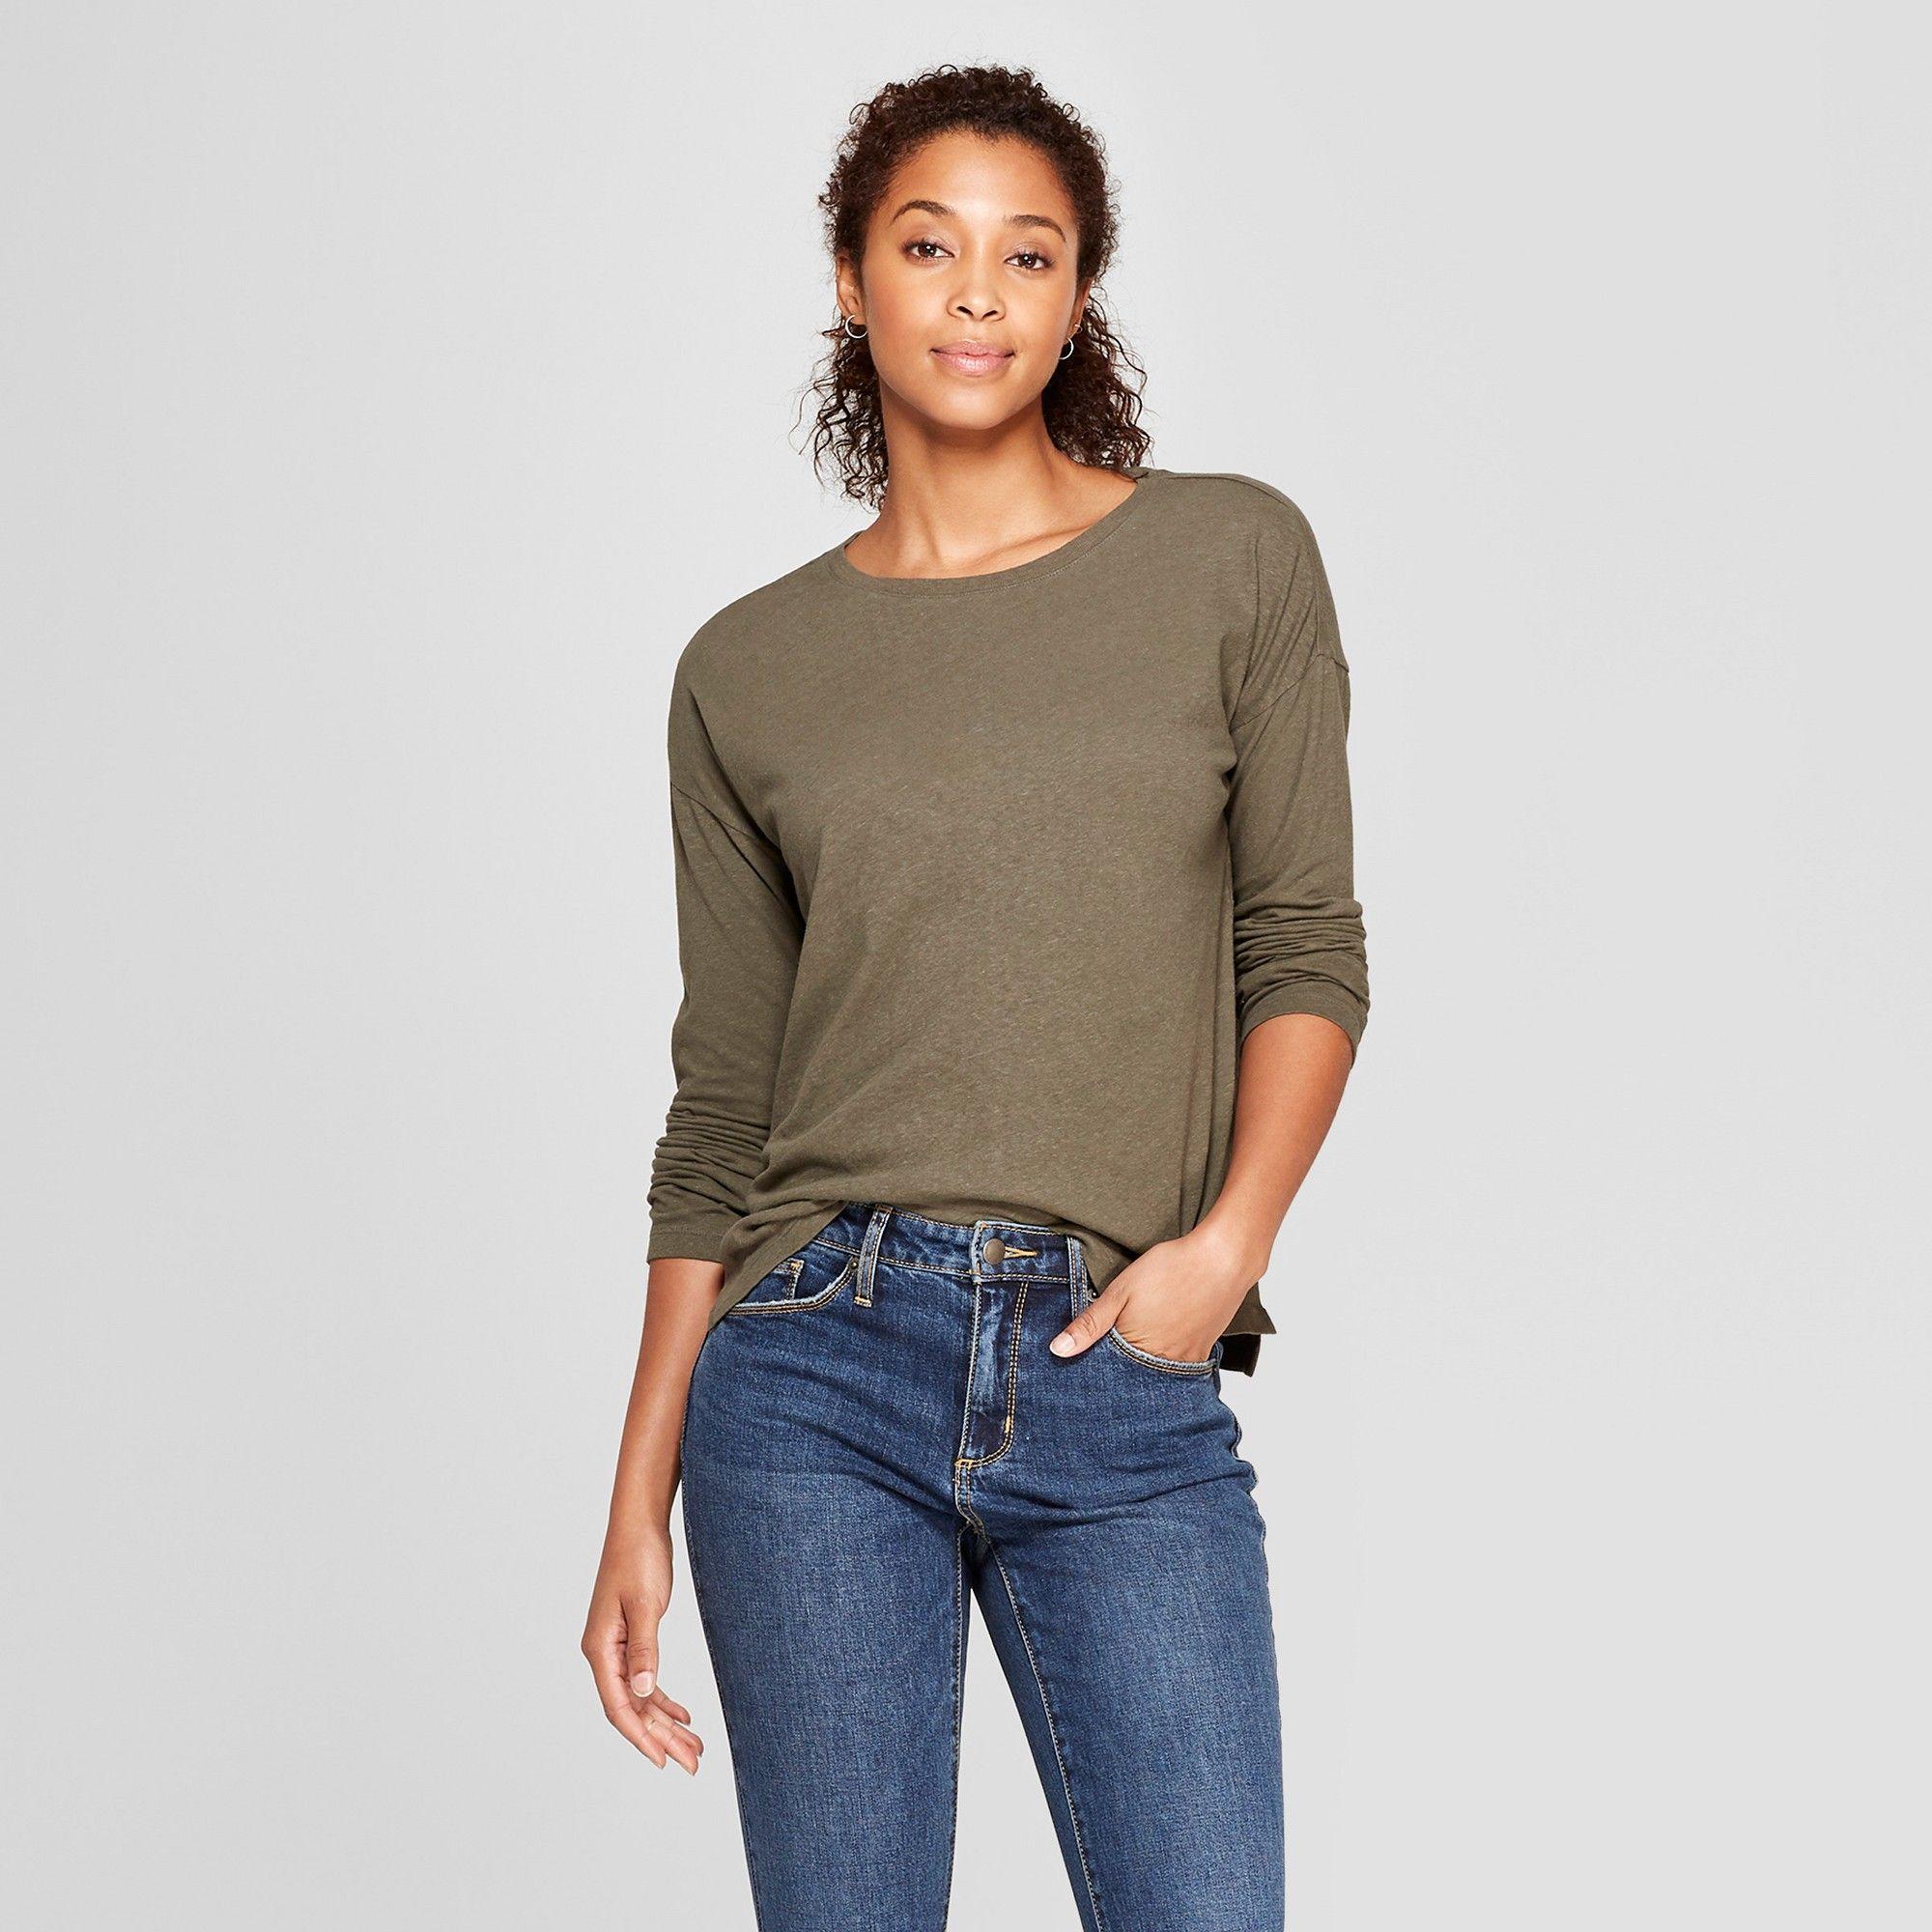 6b652b8c32 Women s Drop Shoulder Long Sleeve T-Shirt - Universal Thread Olive (Green)  Xxl